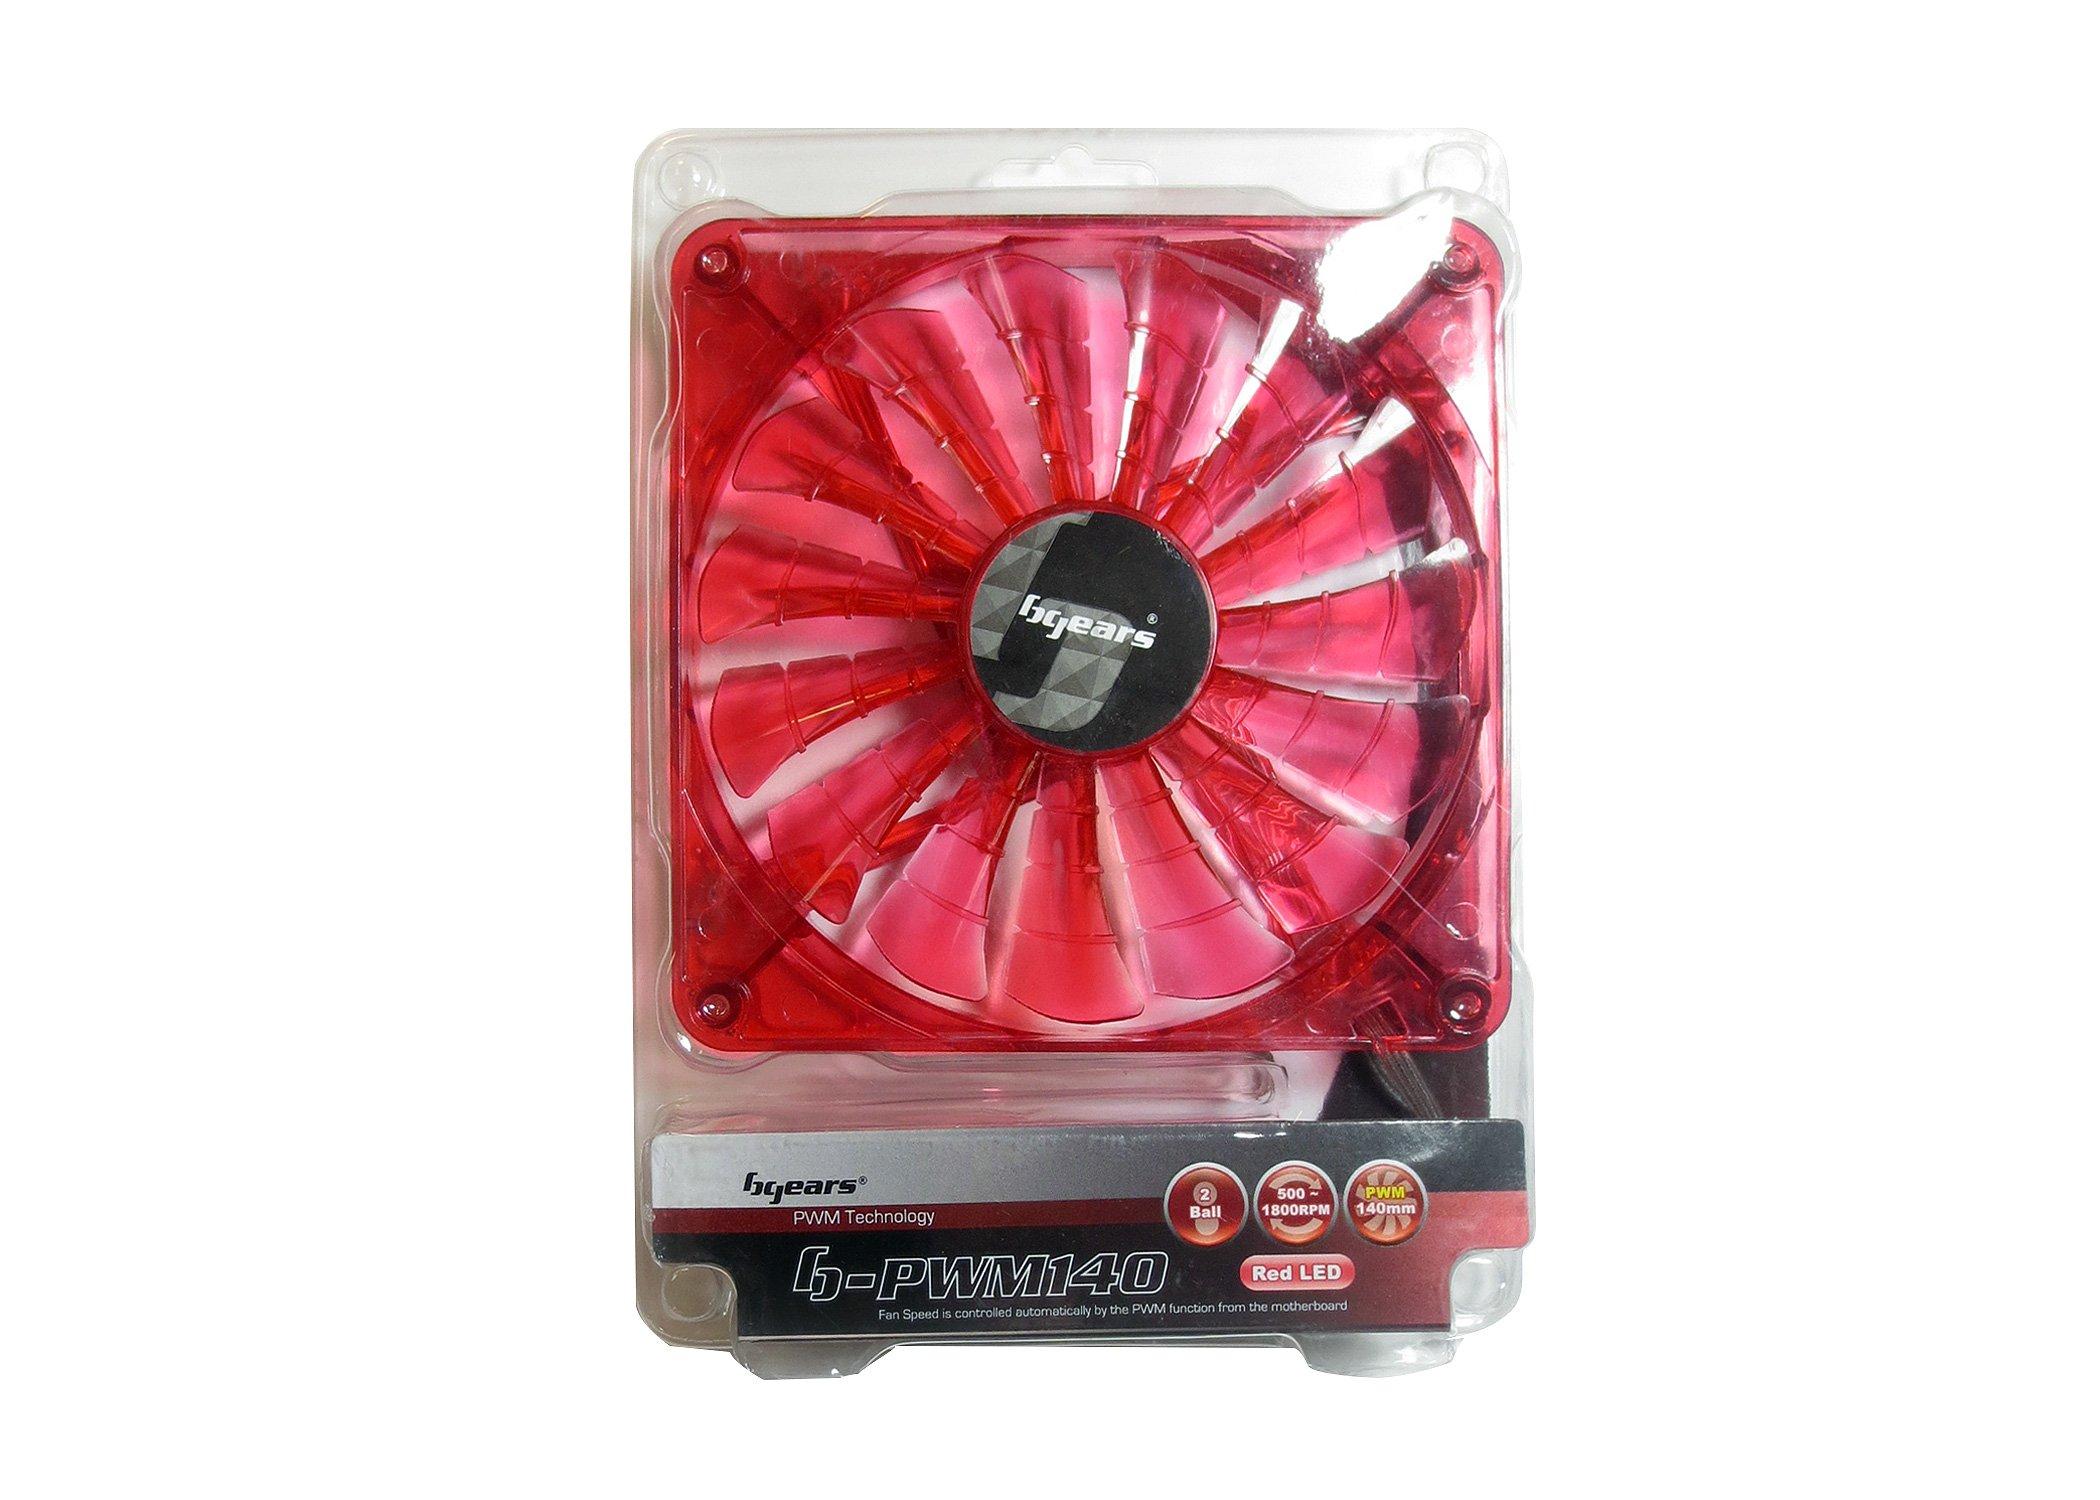 Bgears 140mm High Performance PWM Technology Fan - Translucent Red (b-PWM 140 Red 2ball)